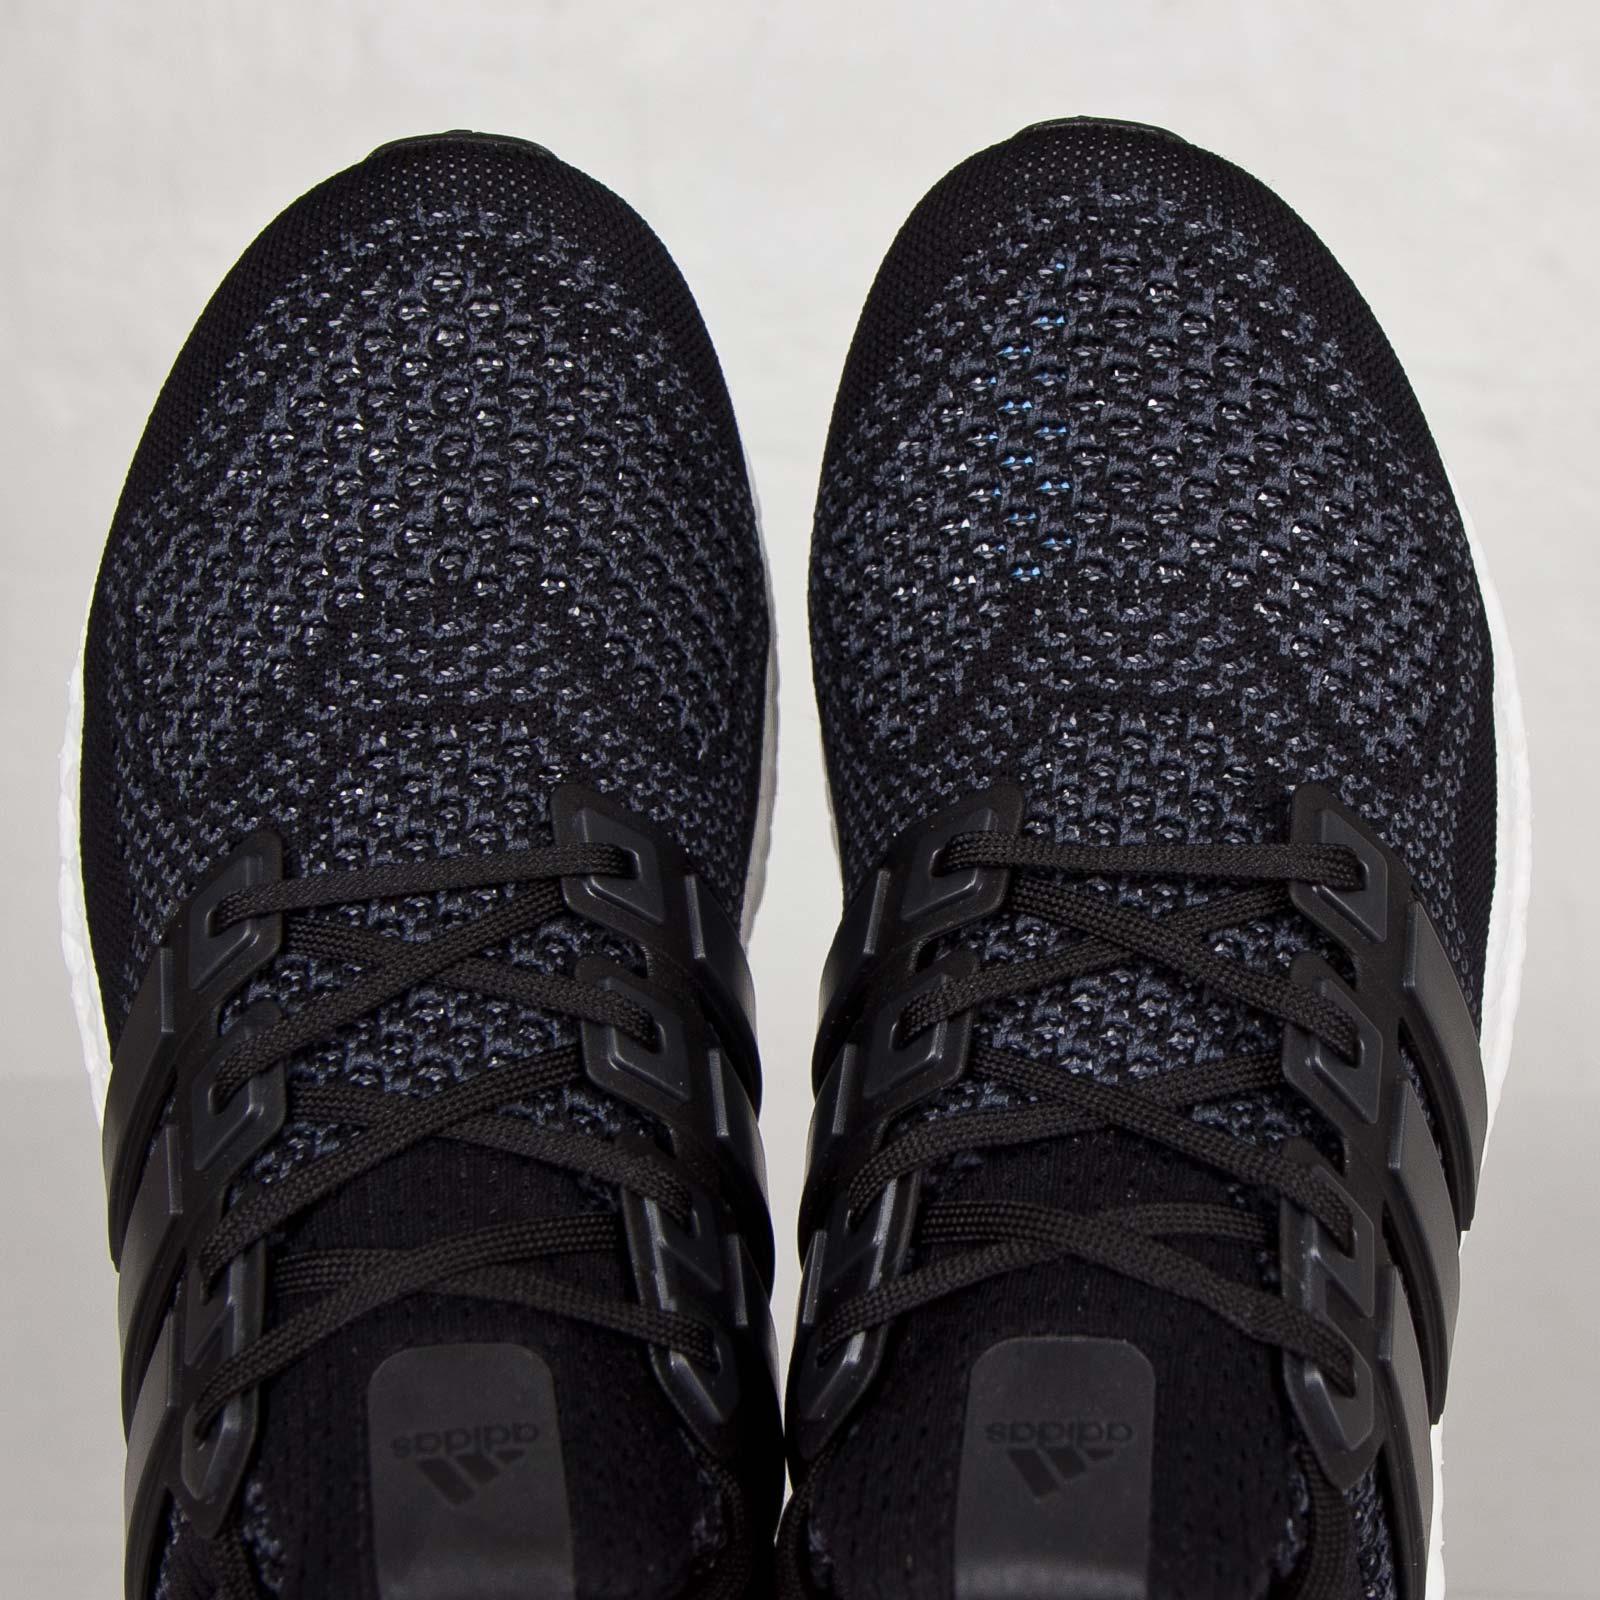 separation shoes a70c4 97cbd best price adidas ultra boost black edition db41d 8d0d2